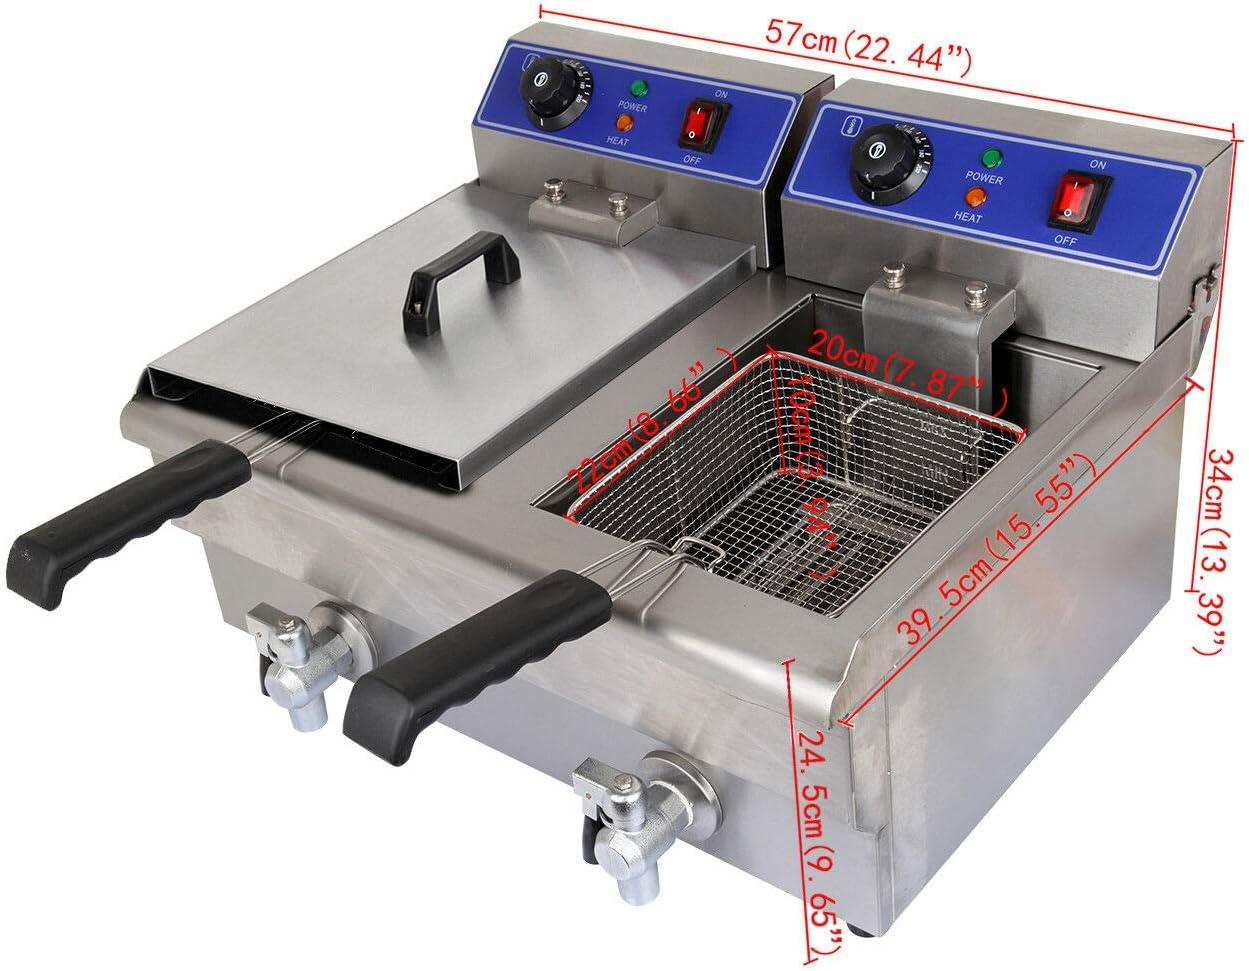 VARAYA 20 Liter Stainless Steel Dual Tank Commercial Countertop Deep Fryer Machine 110v